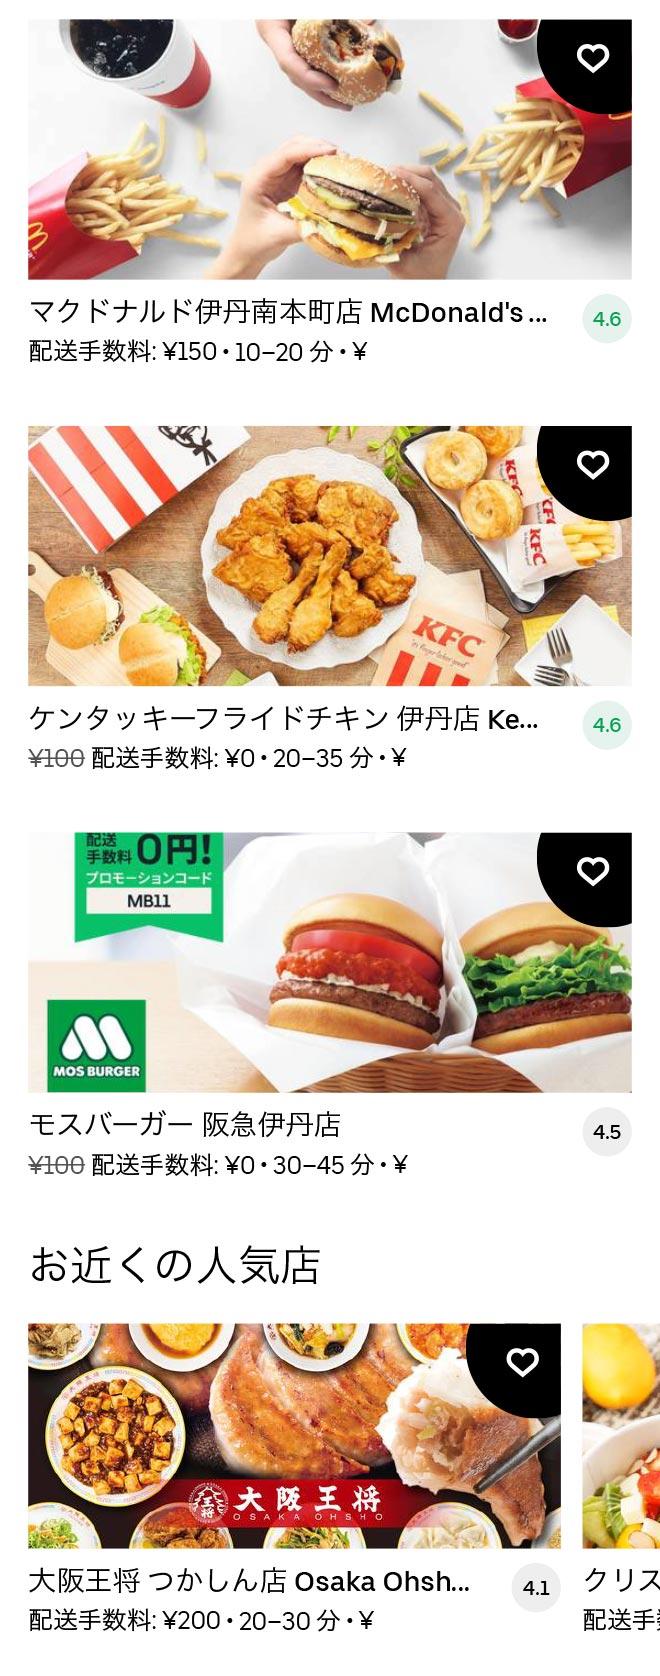 Hankyu itami menu 2011 01